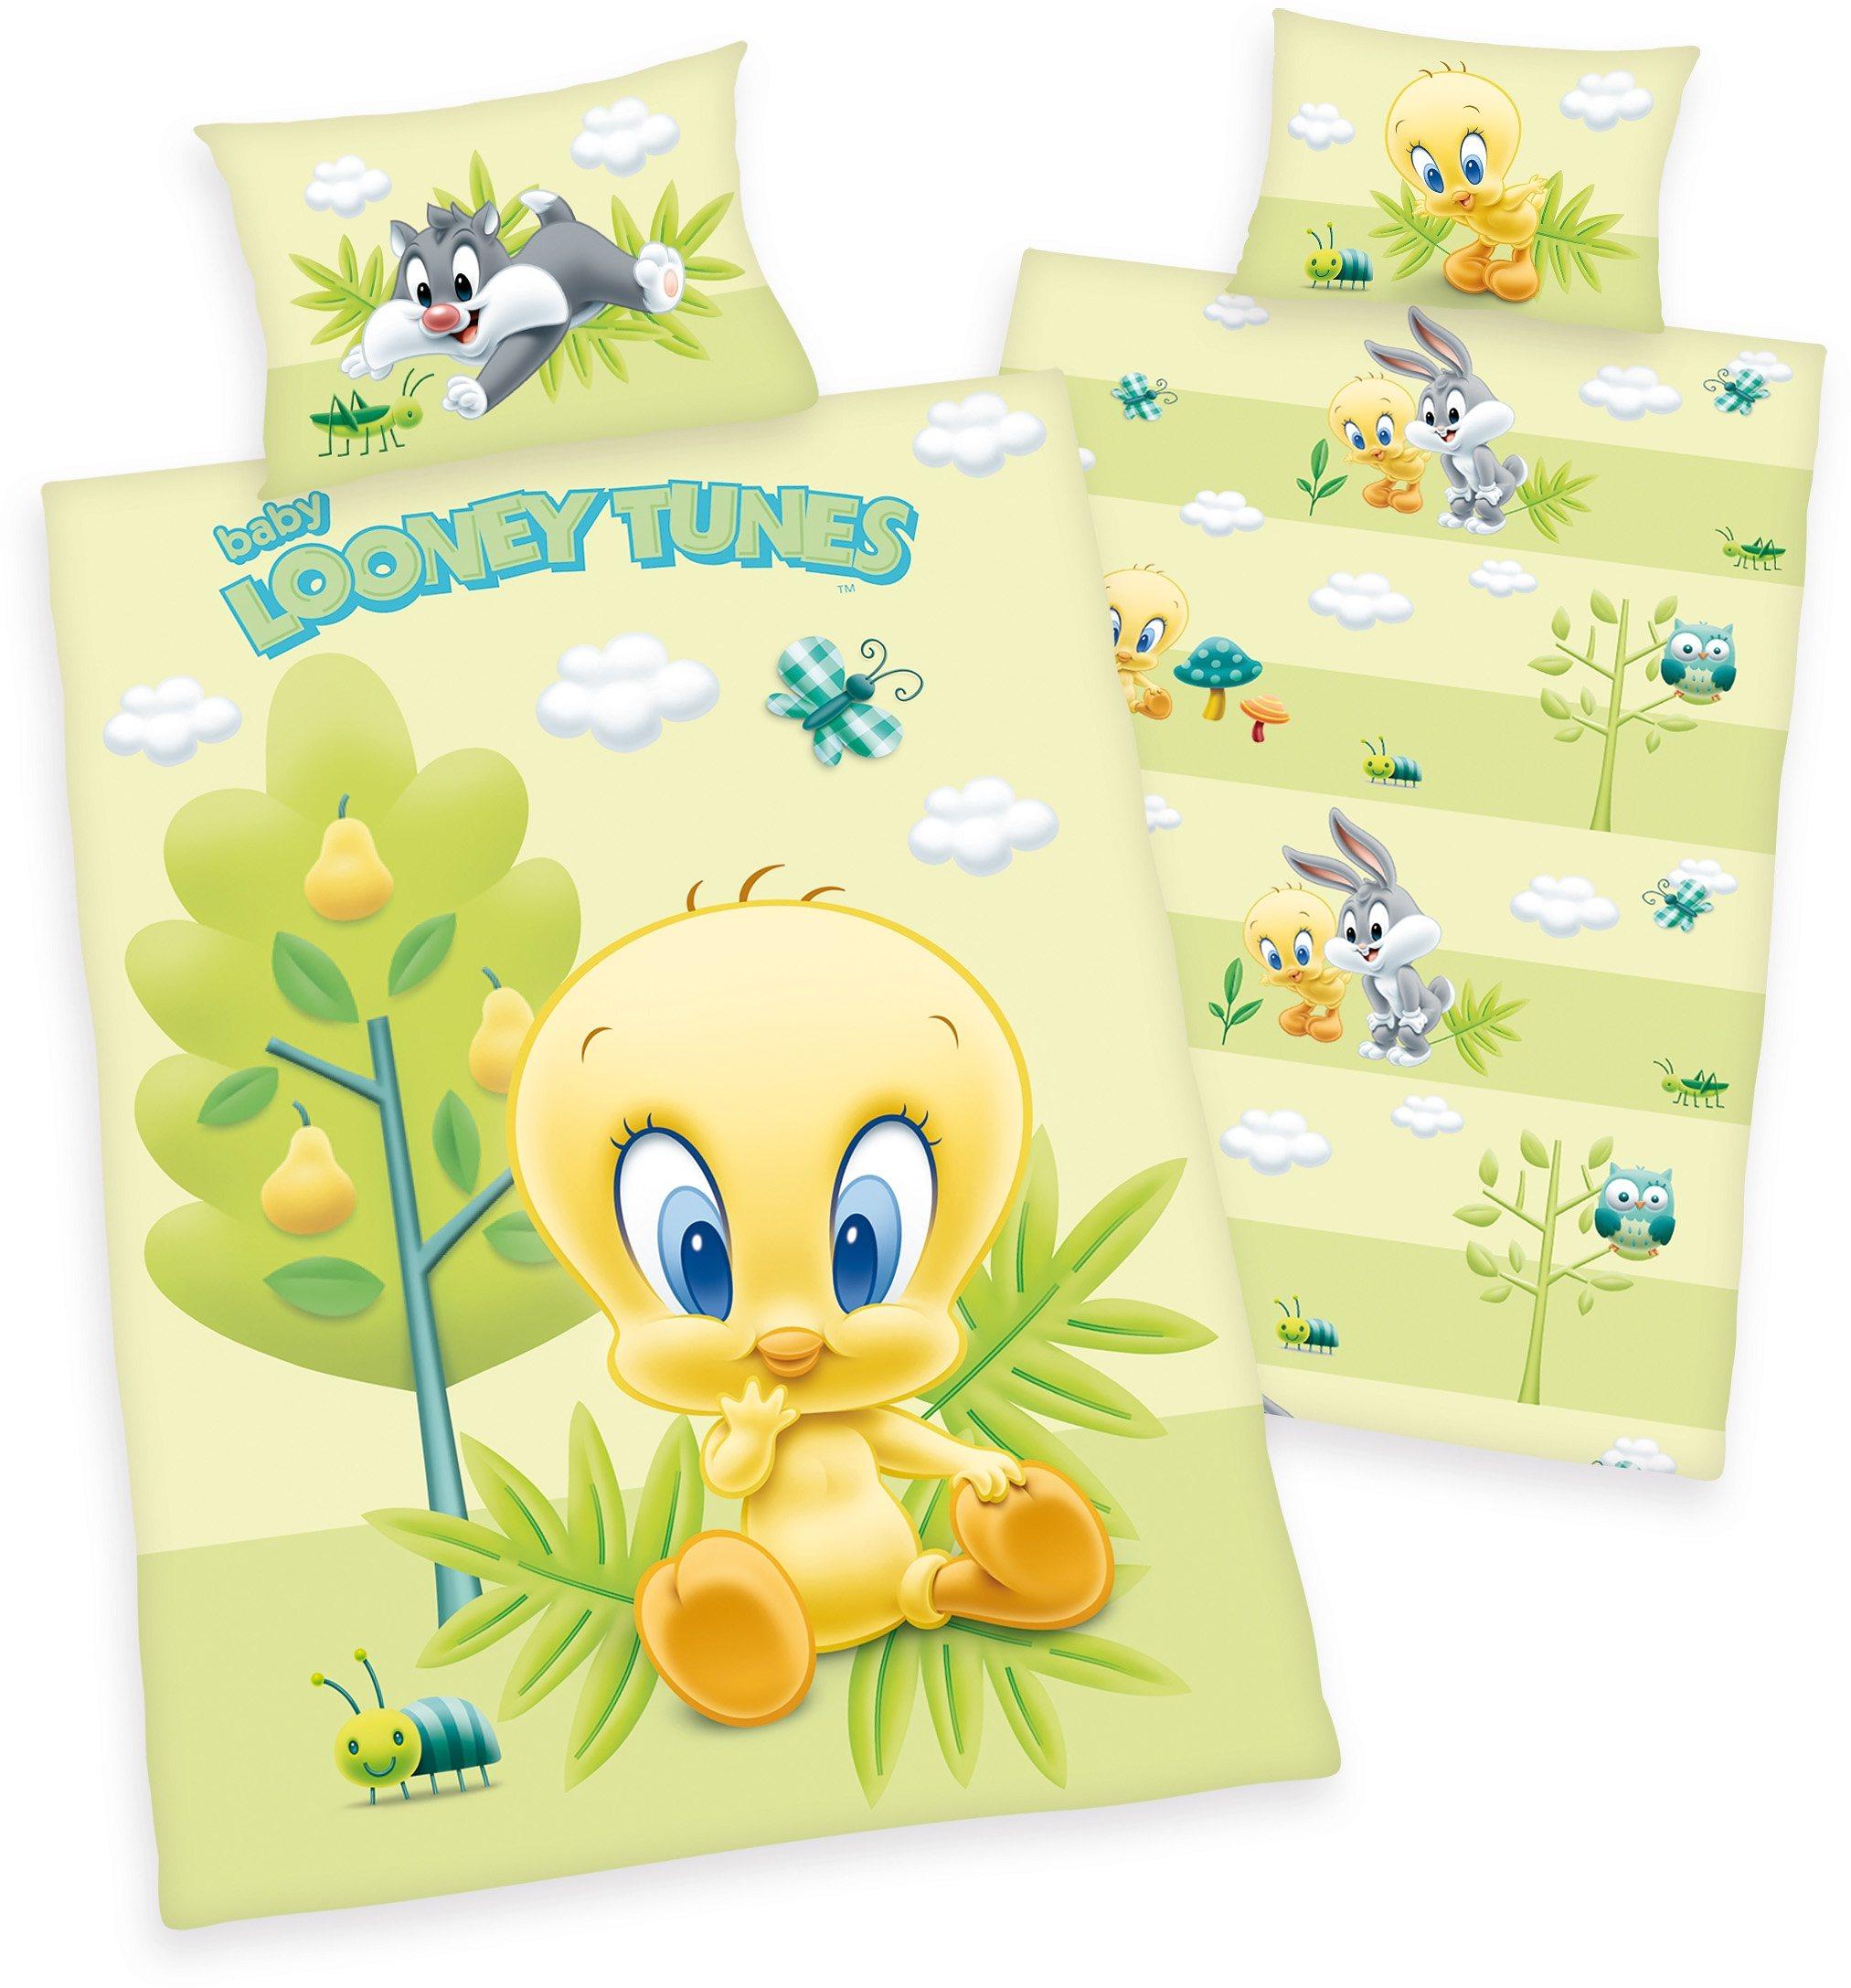 Kinderbettwäsche »Looney Tunes«, LOONEY TUNES, mit Baby Looney Tunes | Kinderzimmer | LOONEY TUNES